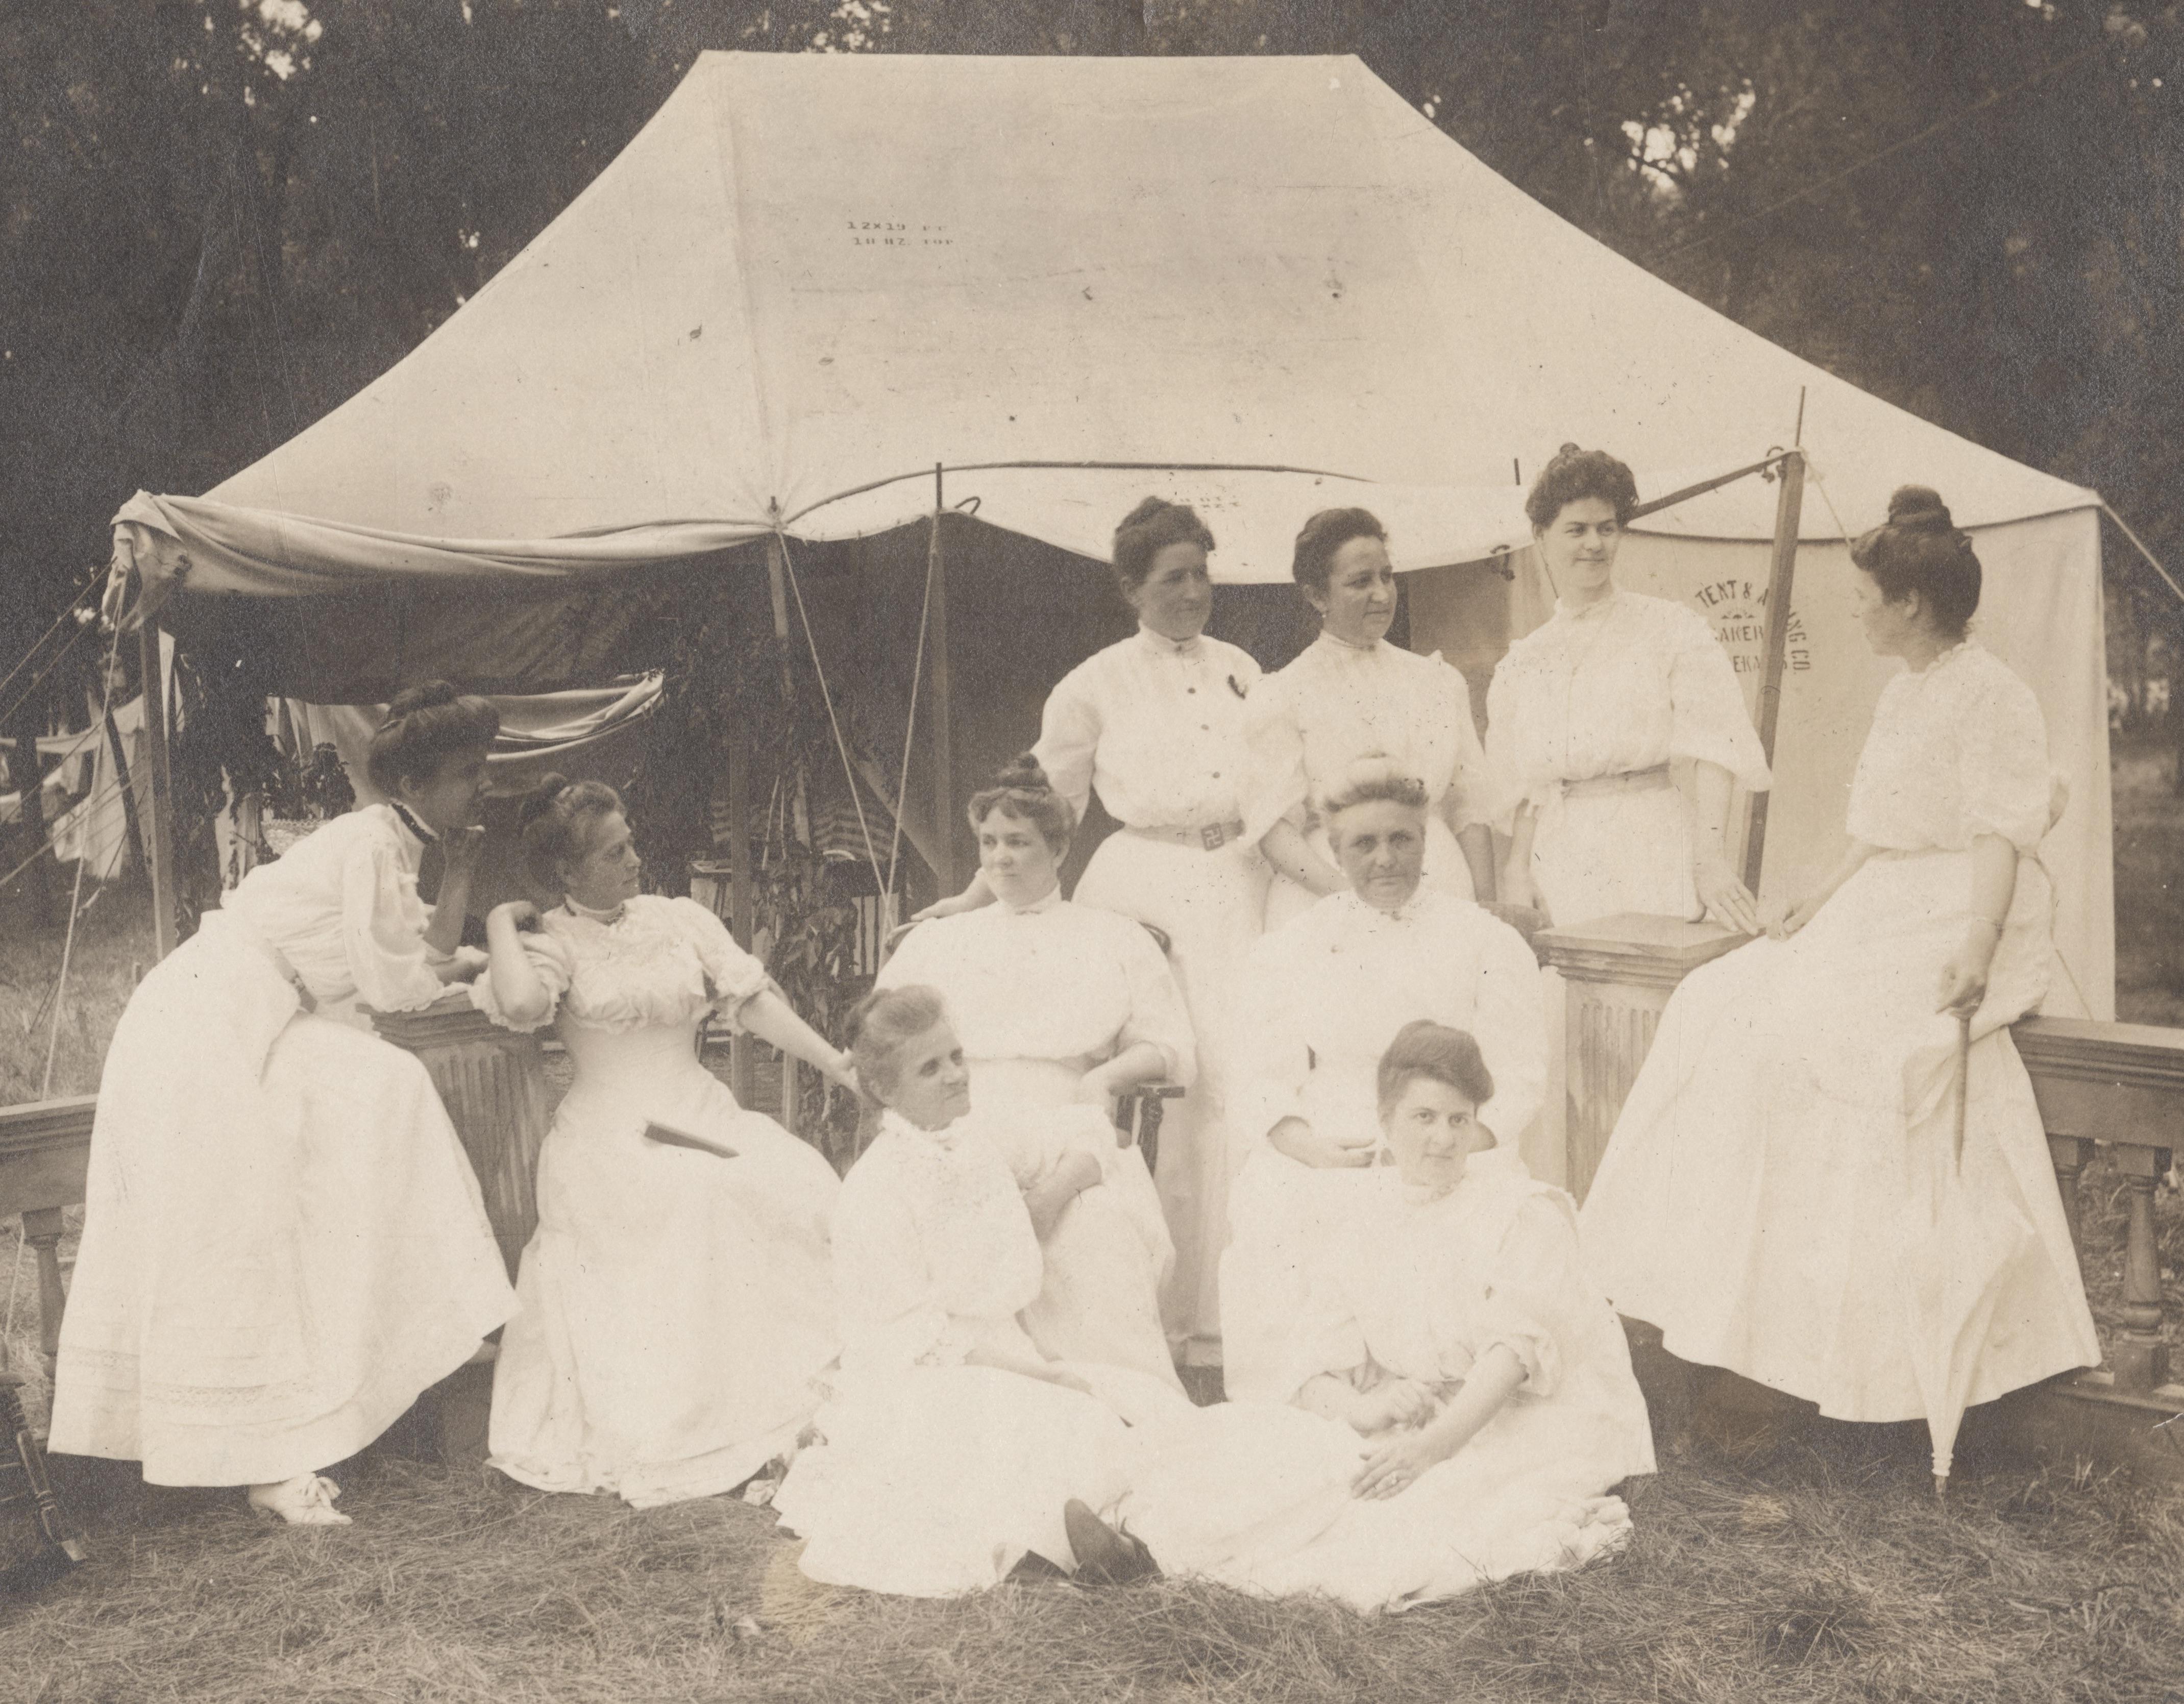 Politics on the Platform: Woman Suffrage at the Chautauqua Event Image